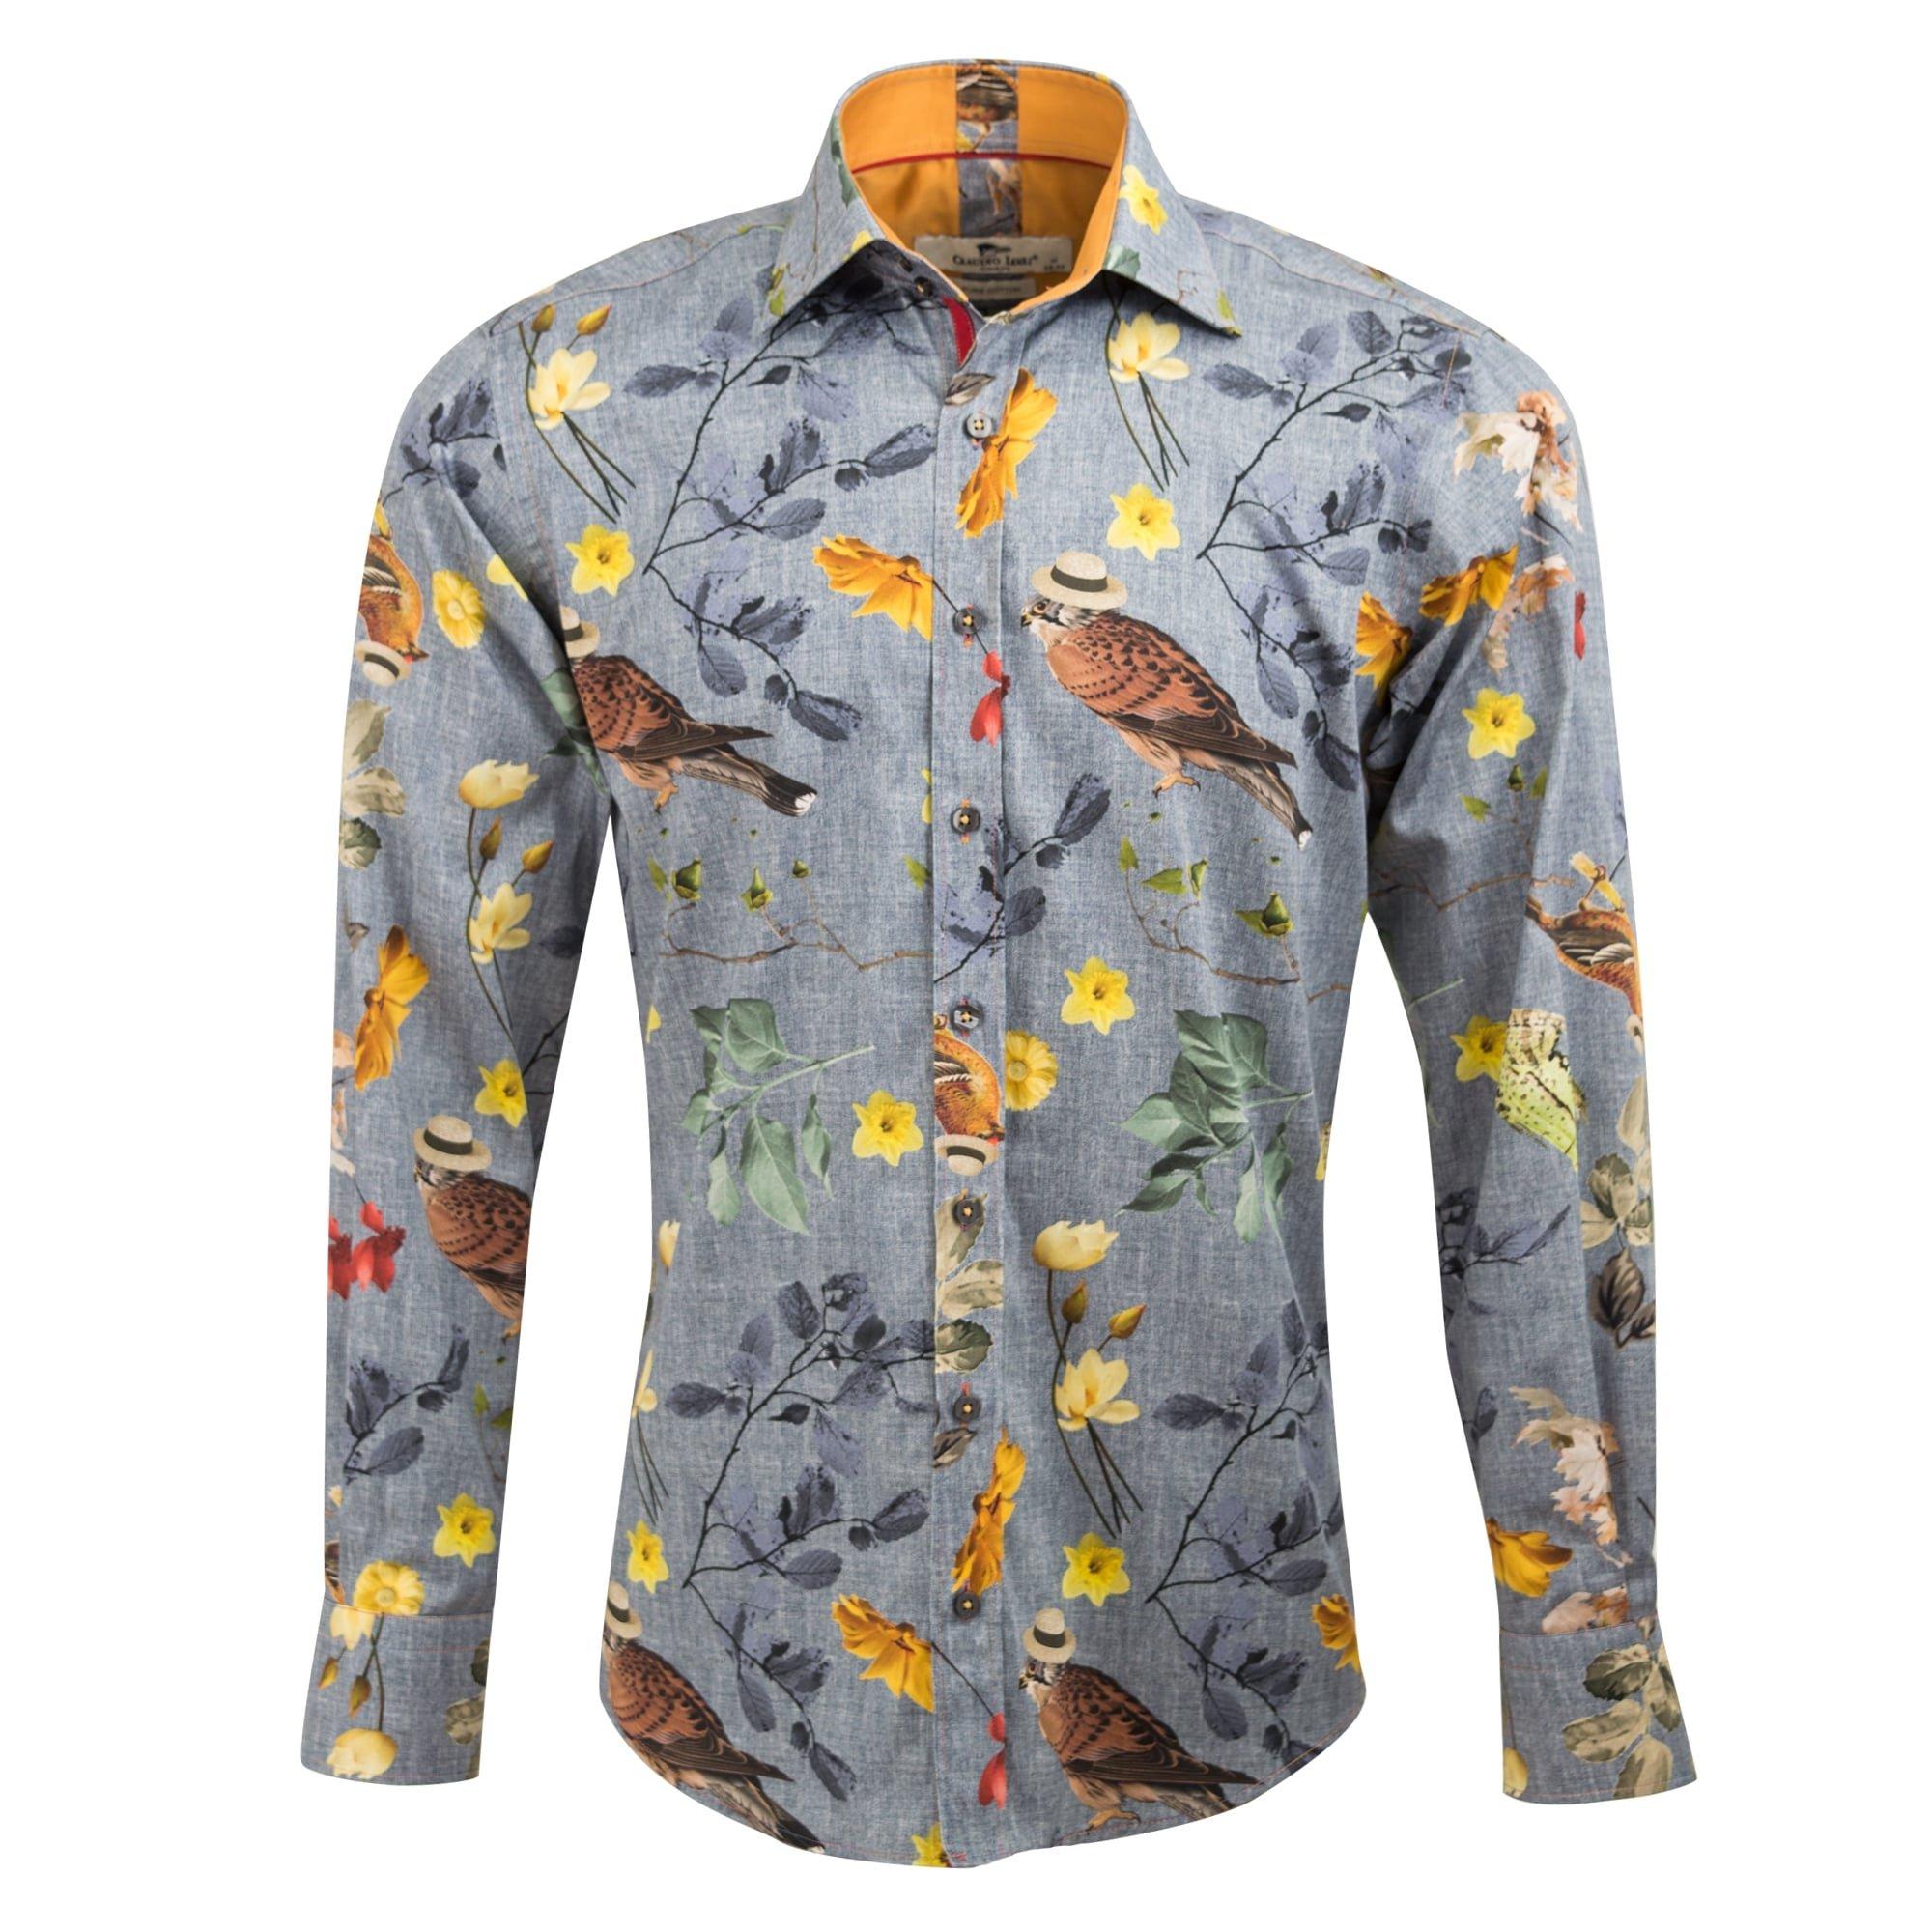 Claudio Lugli Nature Print Designer Luxury Cotton Long Sleeve Slim Fit Men's Shirt CP6352 Large Grey White & Grey